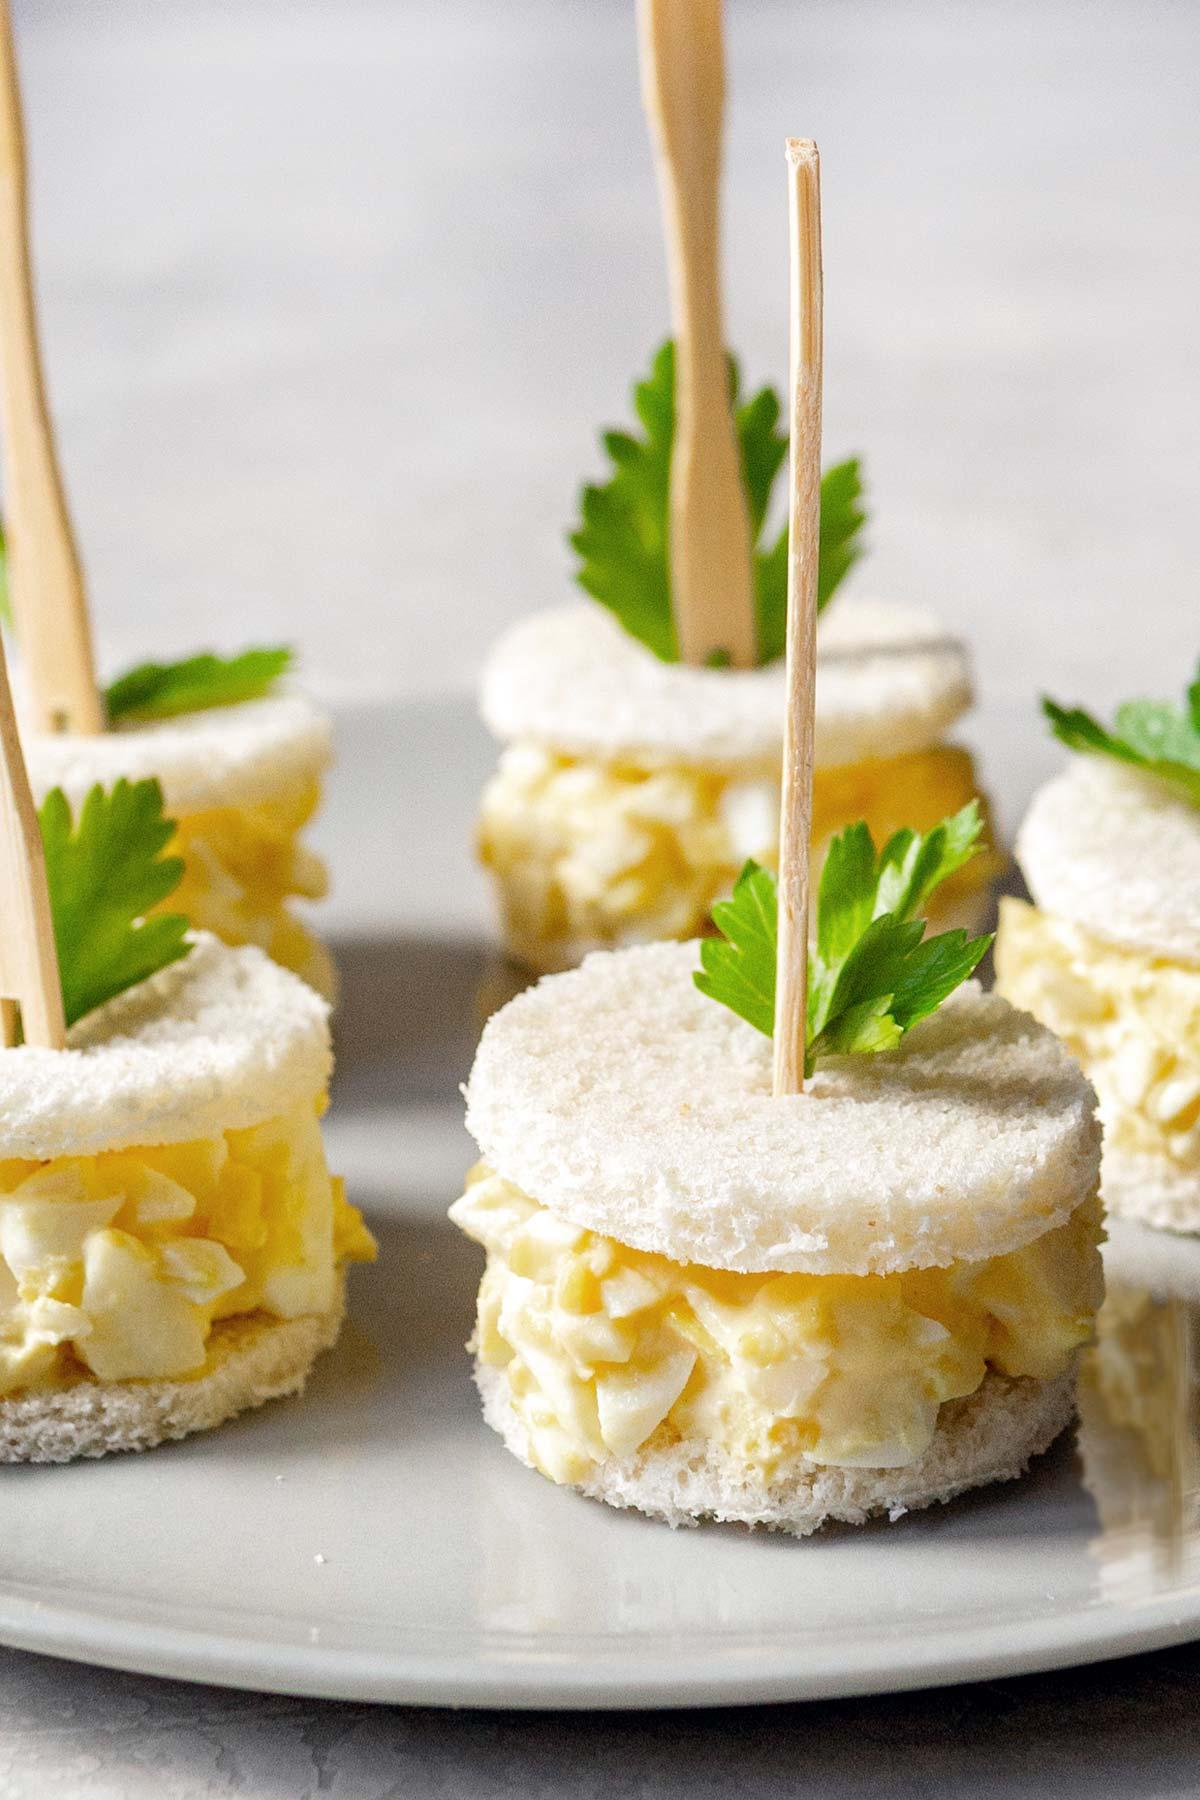 Egg salad tea sandwiches on a plate.